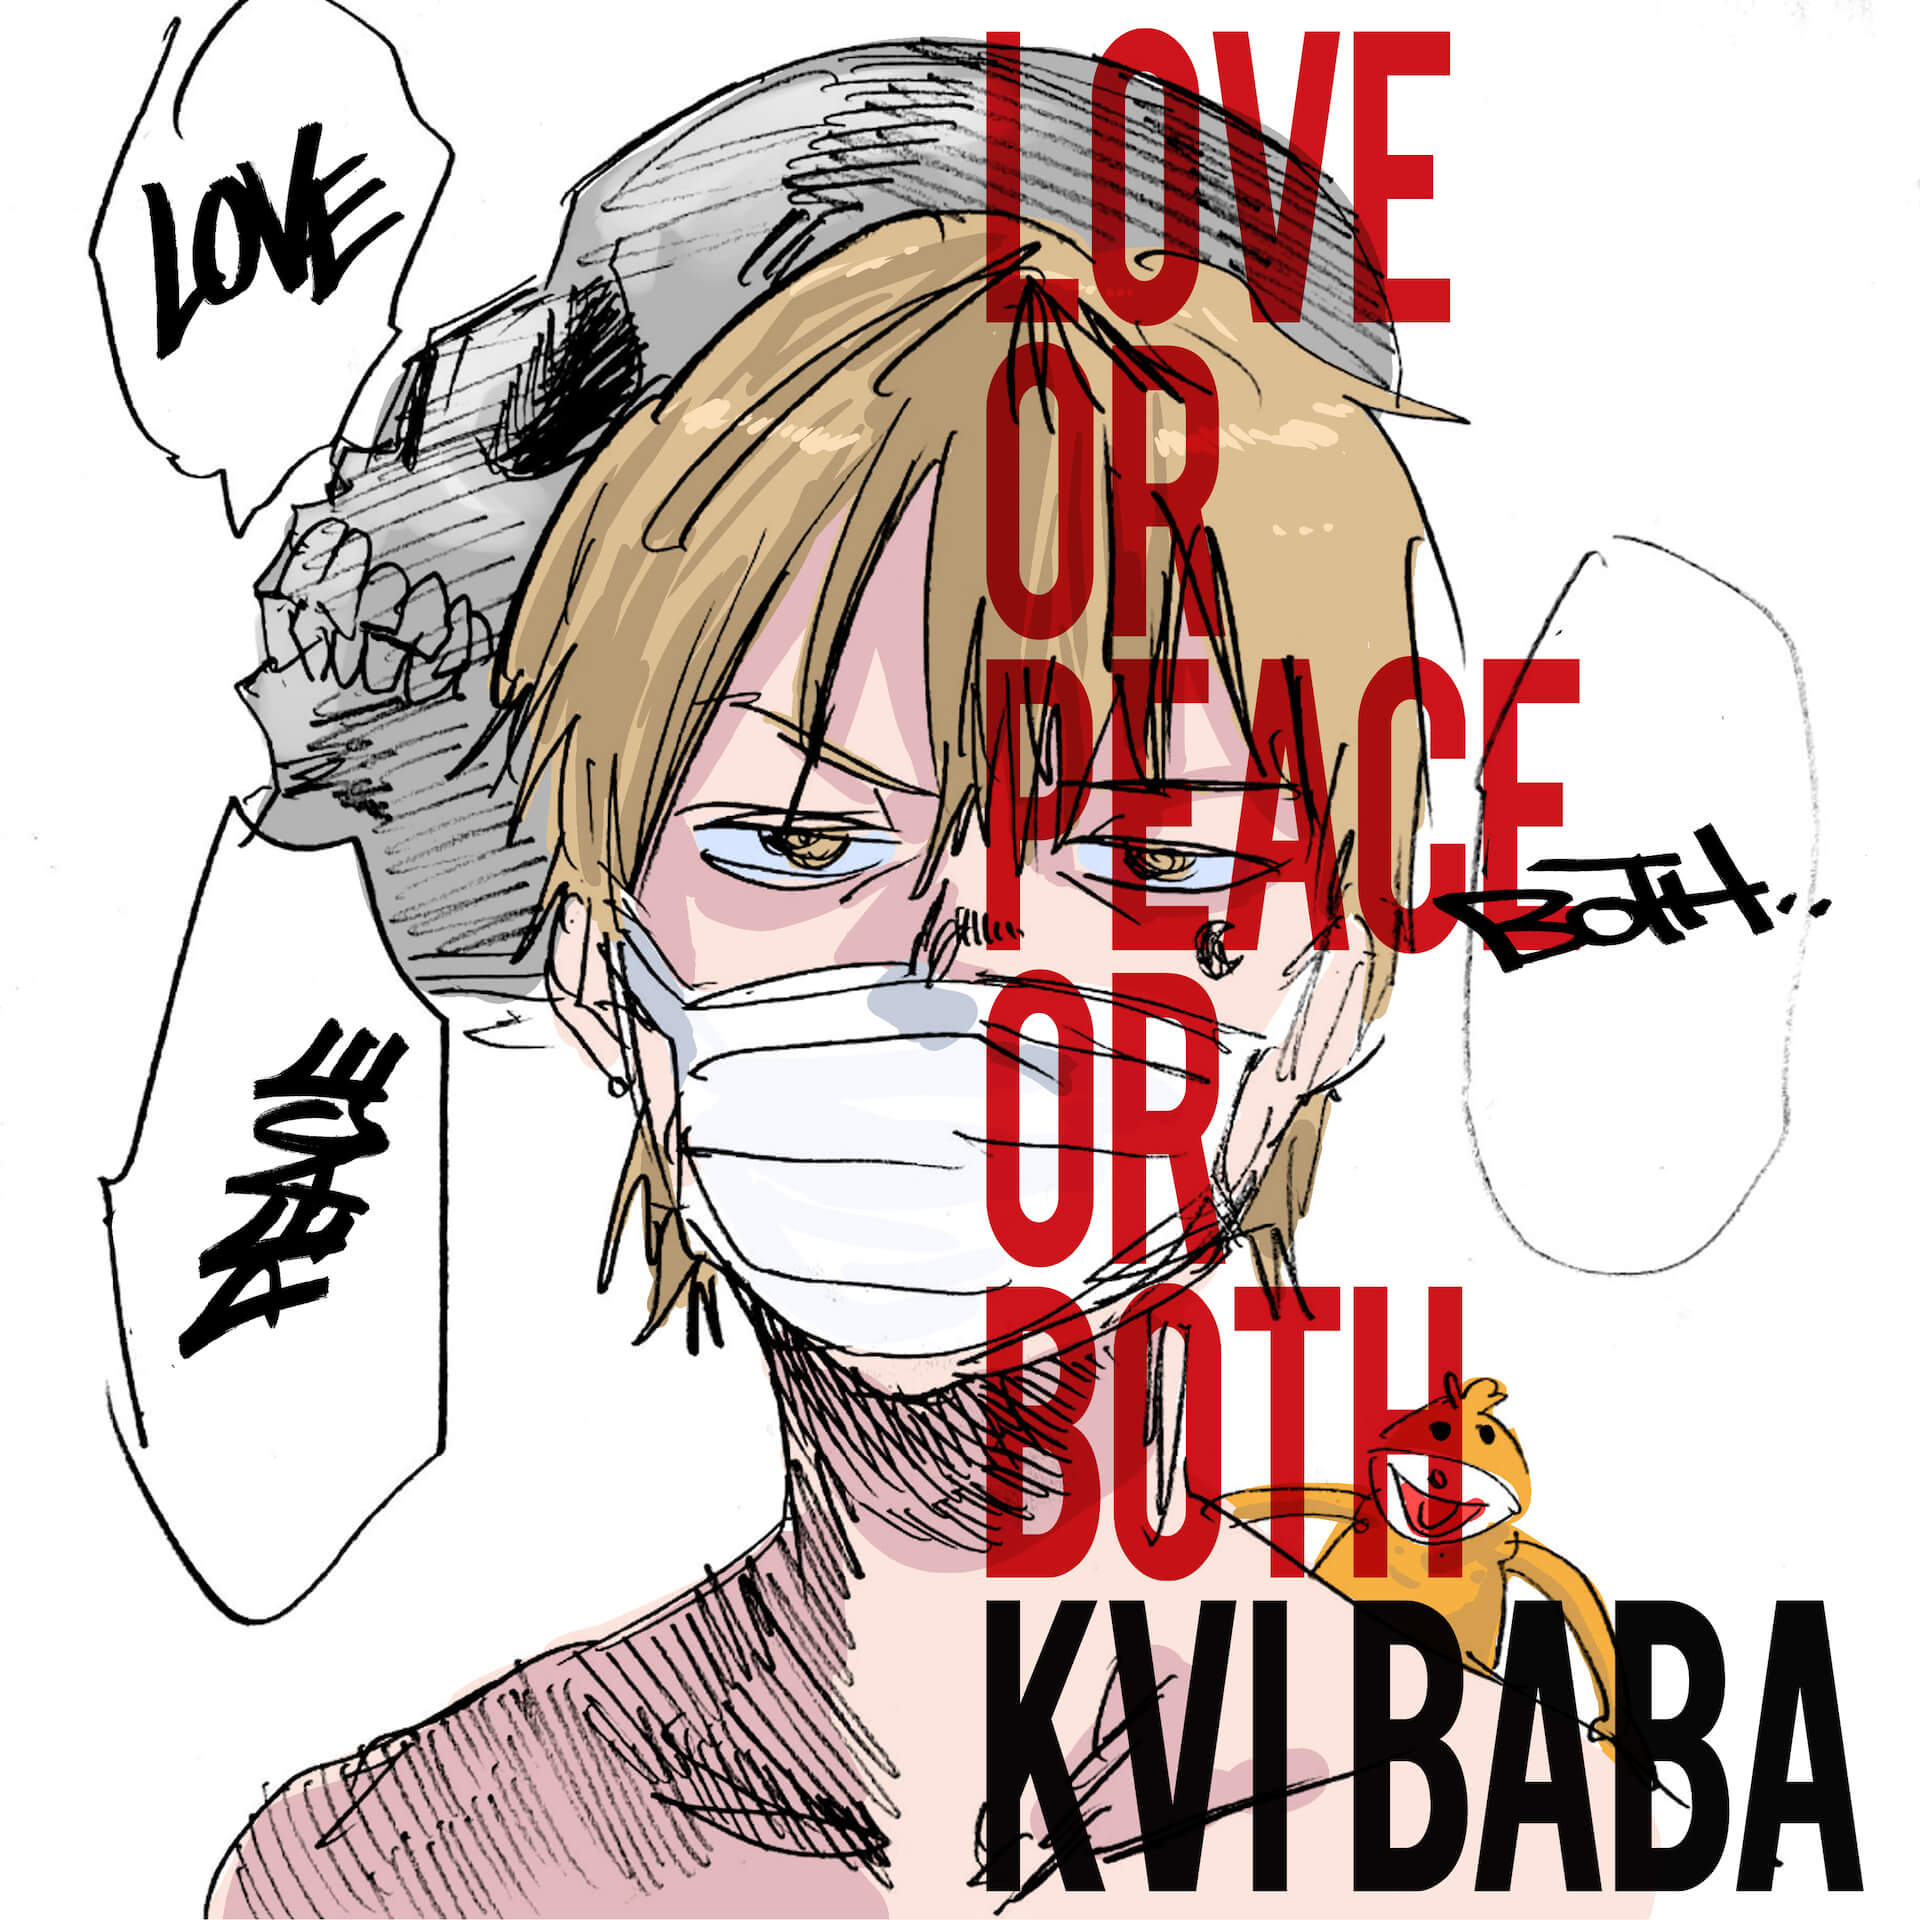 Kvi Baba最新EP『LOVE or PEACE or BOTH』から、vividboooy とのコラボ曲MVを公開!全編をiPhone12 Pro Maxで撮影した縦型に music201119_kvibaba_mv_1